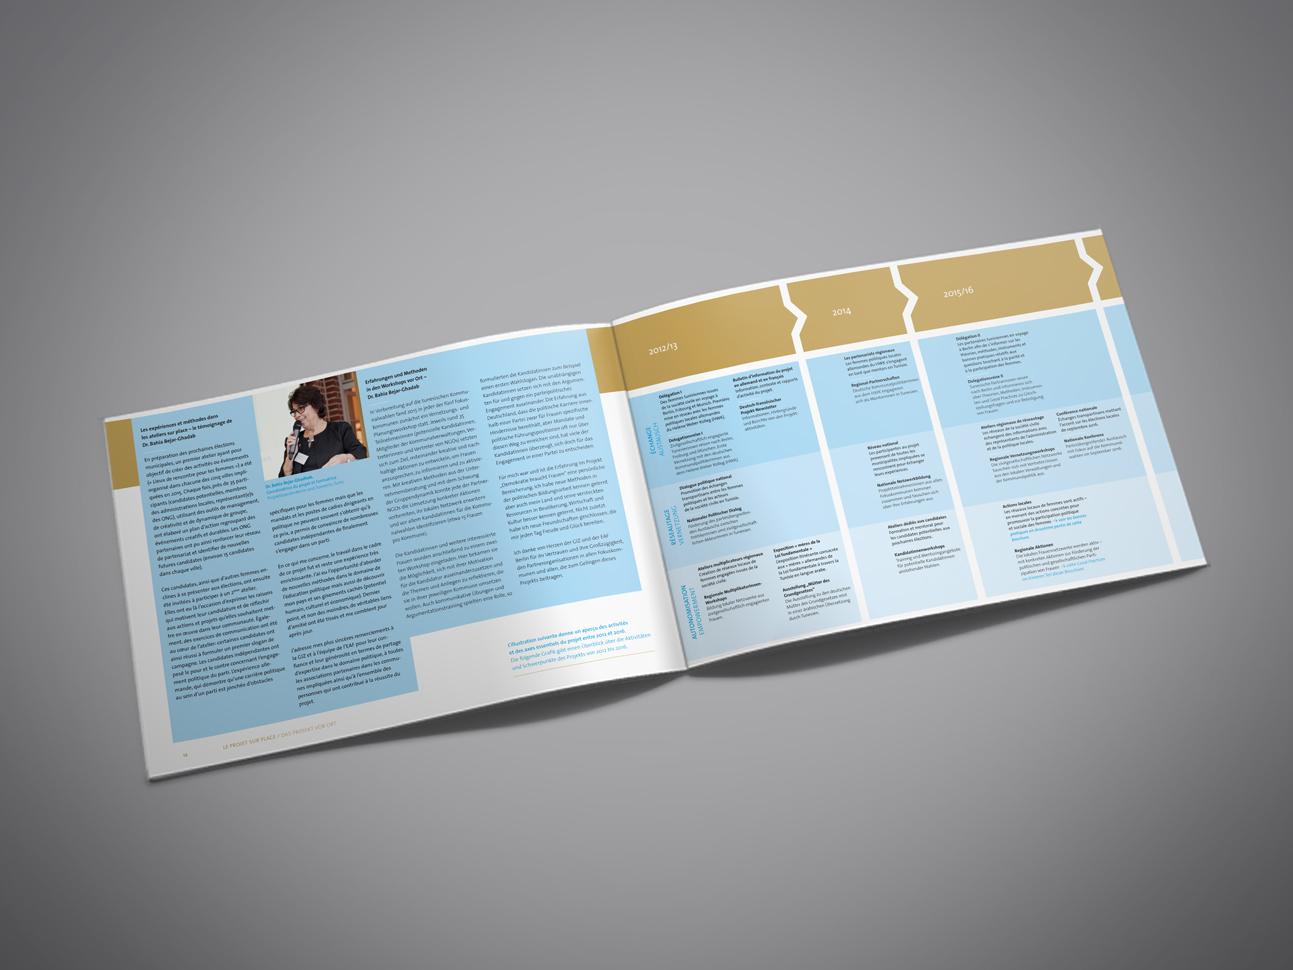 martin_zech_design_projekt_design_demokratie-braucht-frauen_broschuere_uebersicht